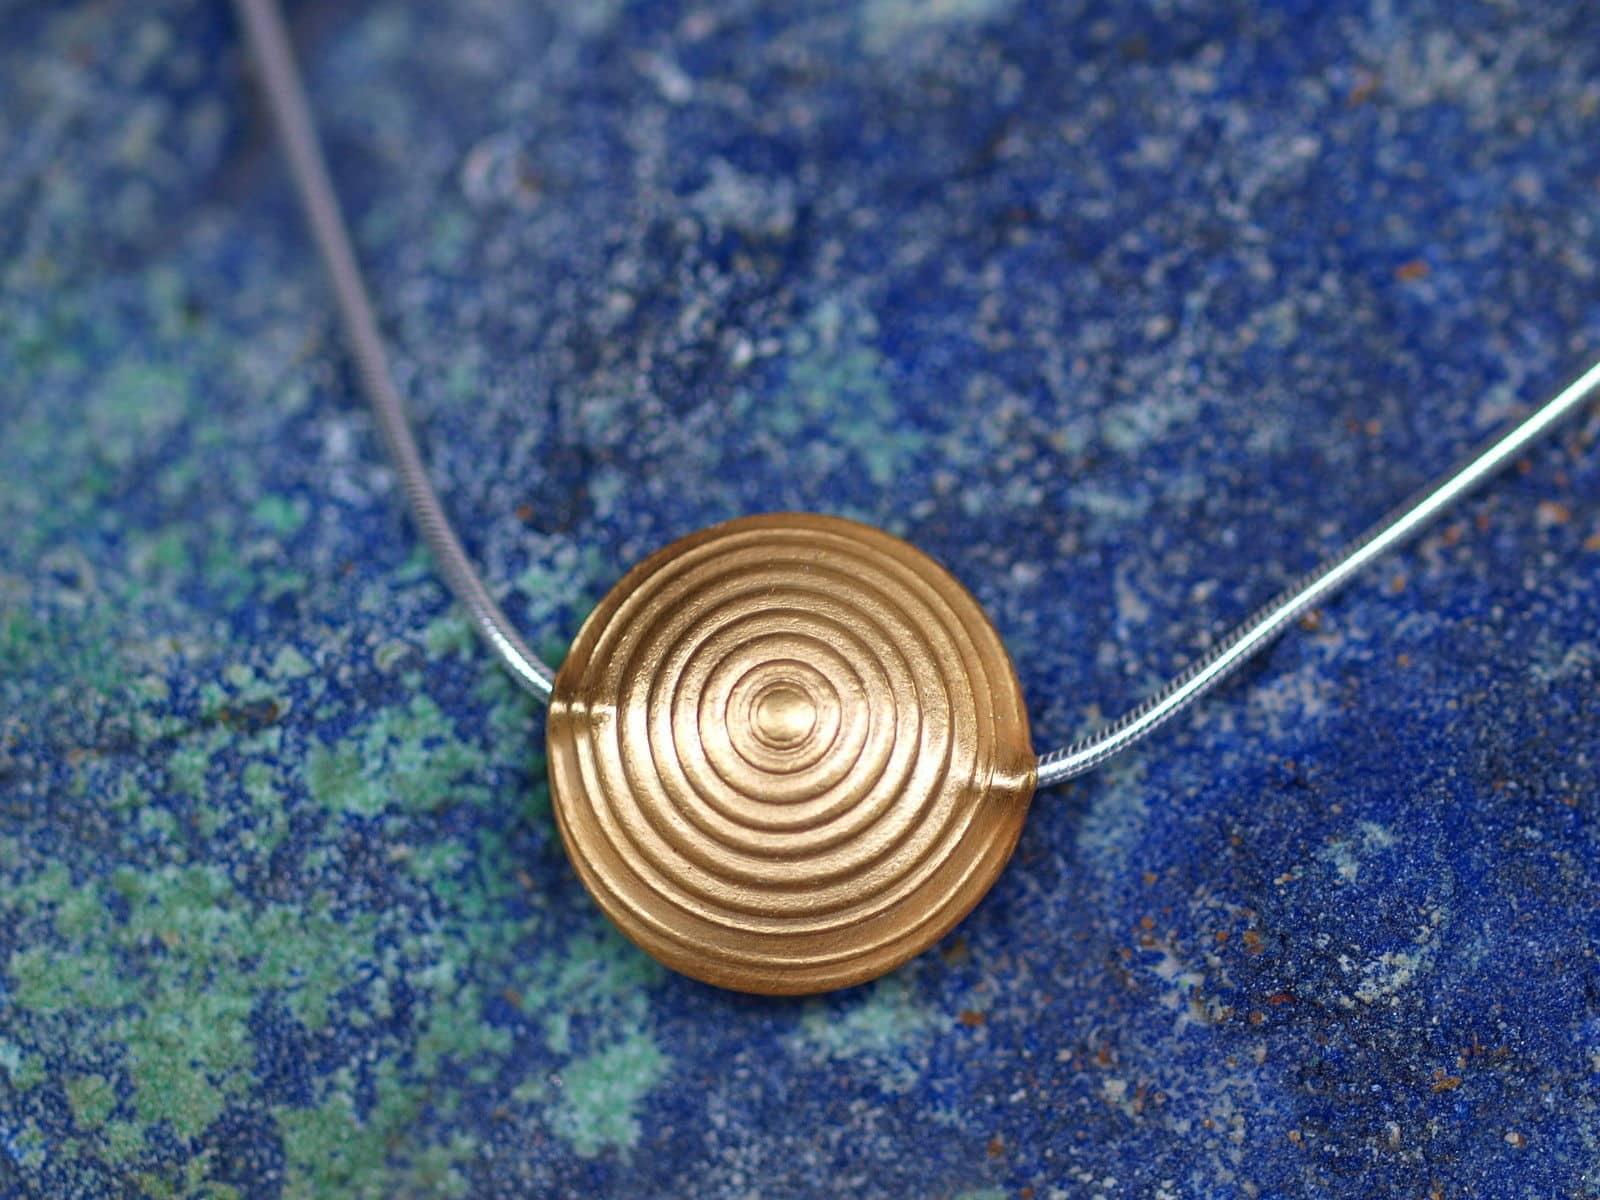 Designer Kette Silber tlw vergoldet ziselierte Scheibe Sonne Linse